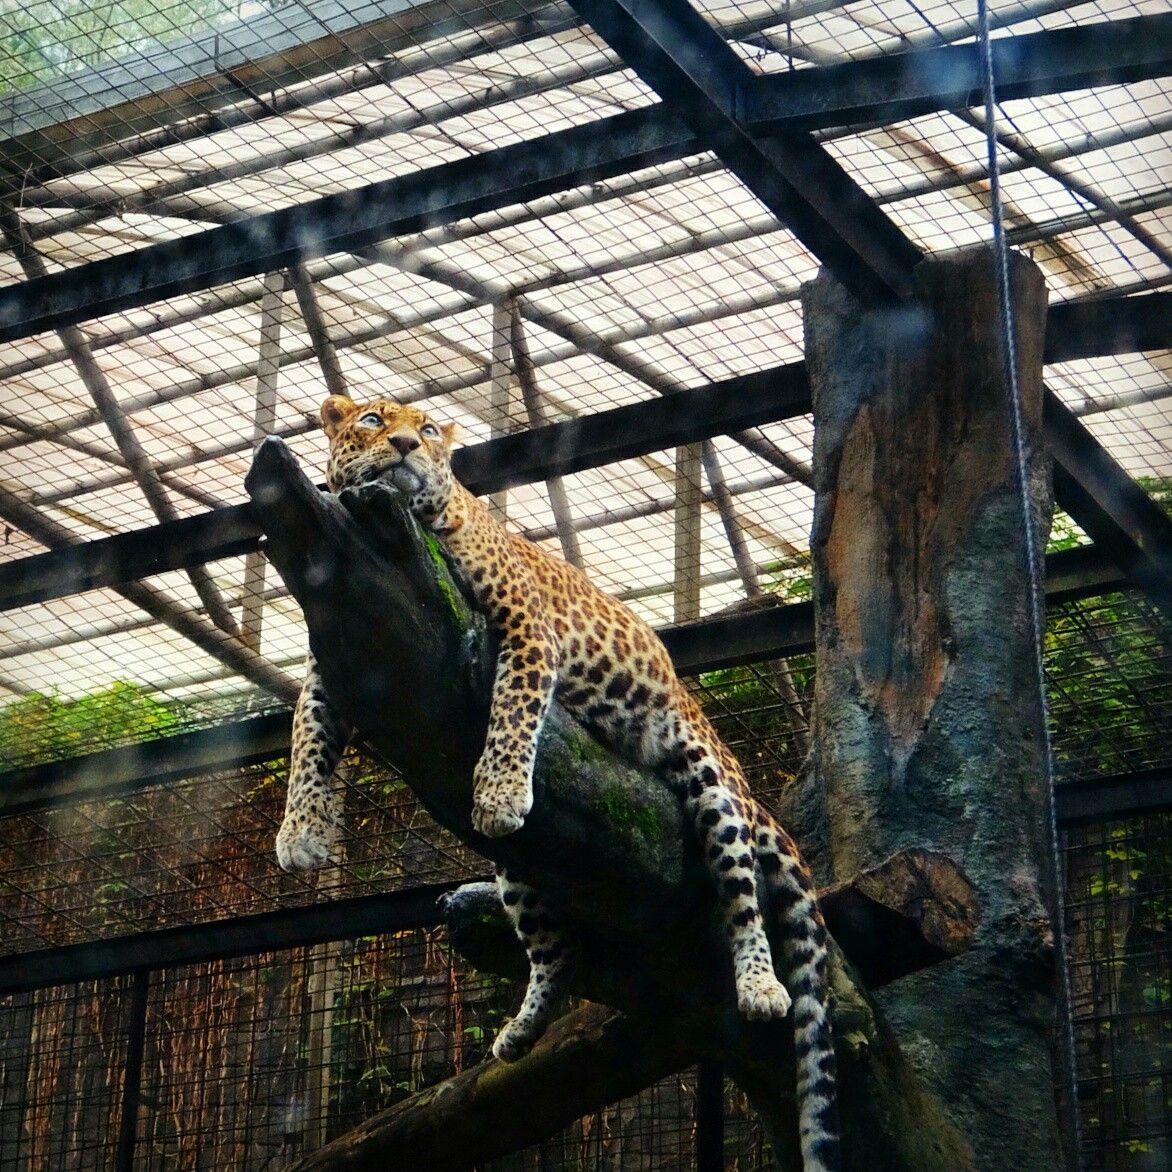 Taman Safari Zoo, Cisarua, Bogor Indonesia, Taman